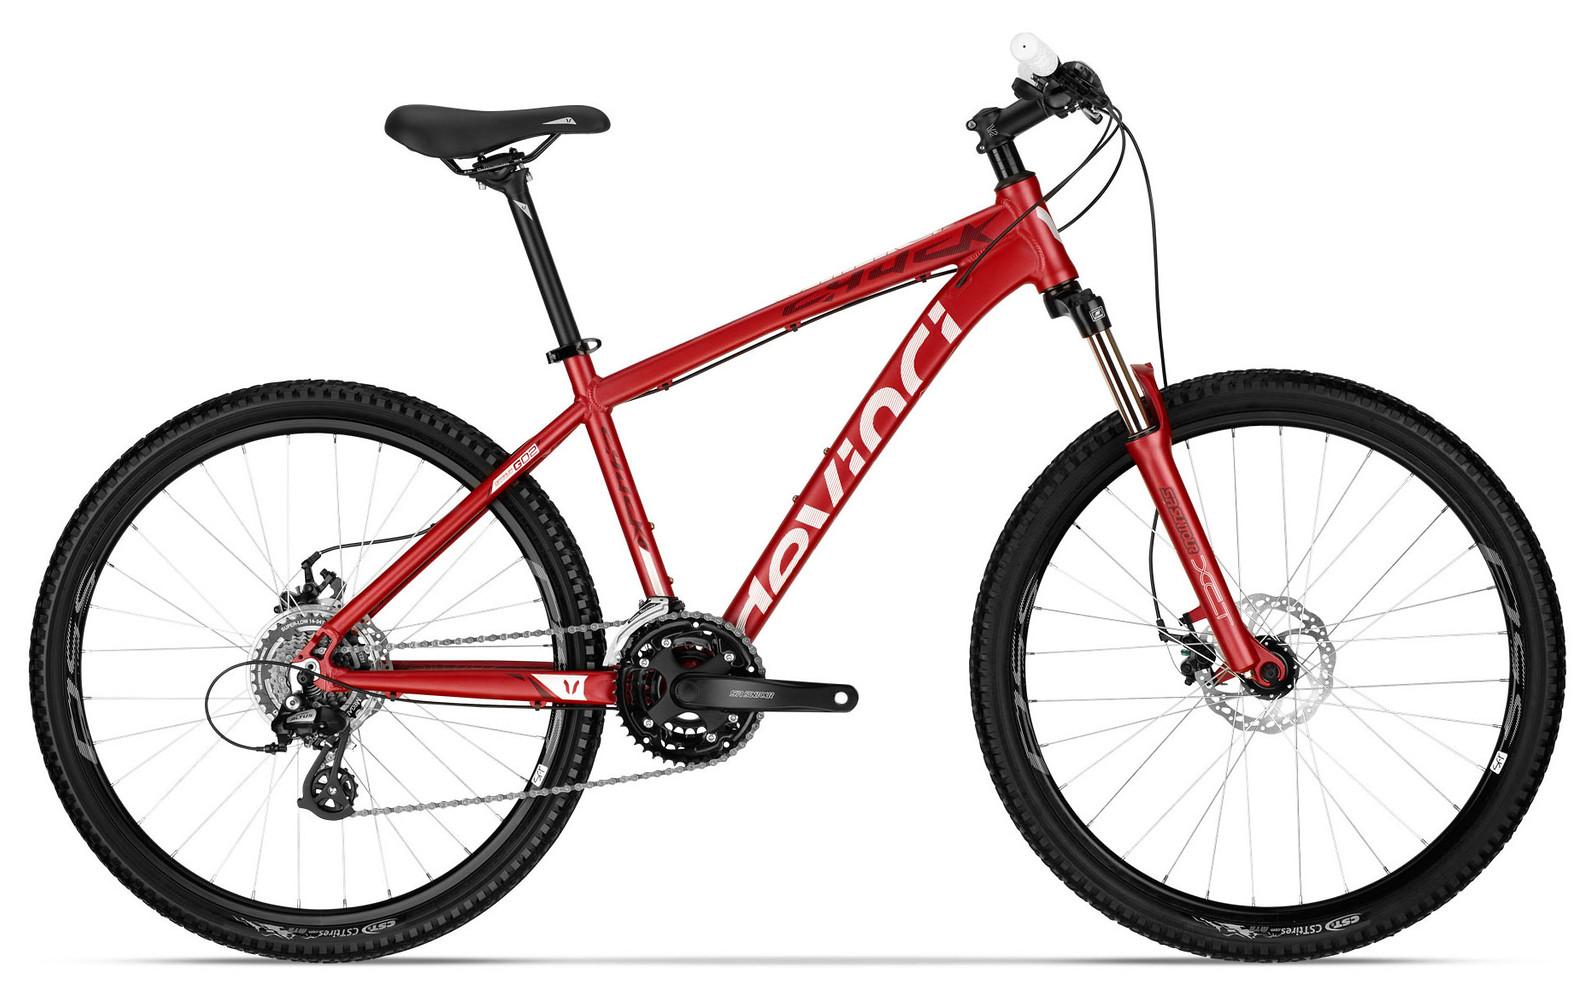 Bike - 2014 Devinci Chuck S WF